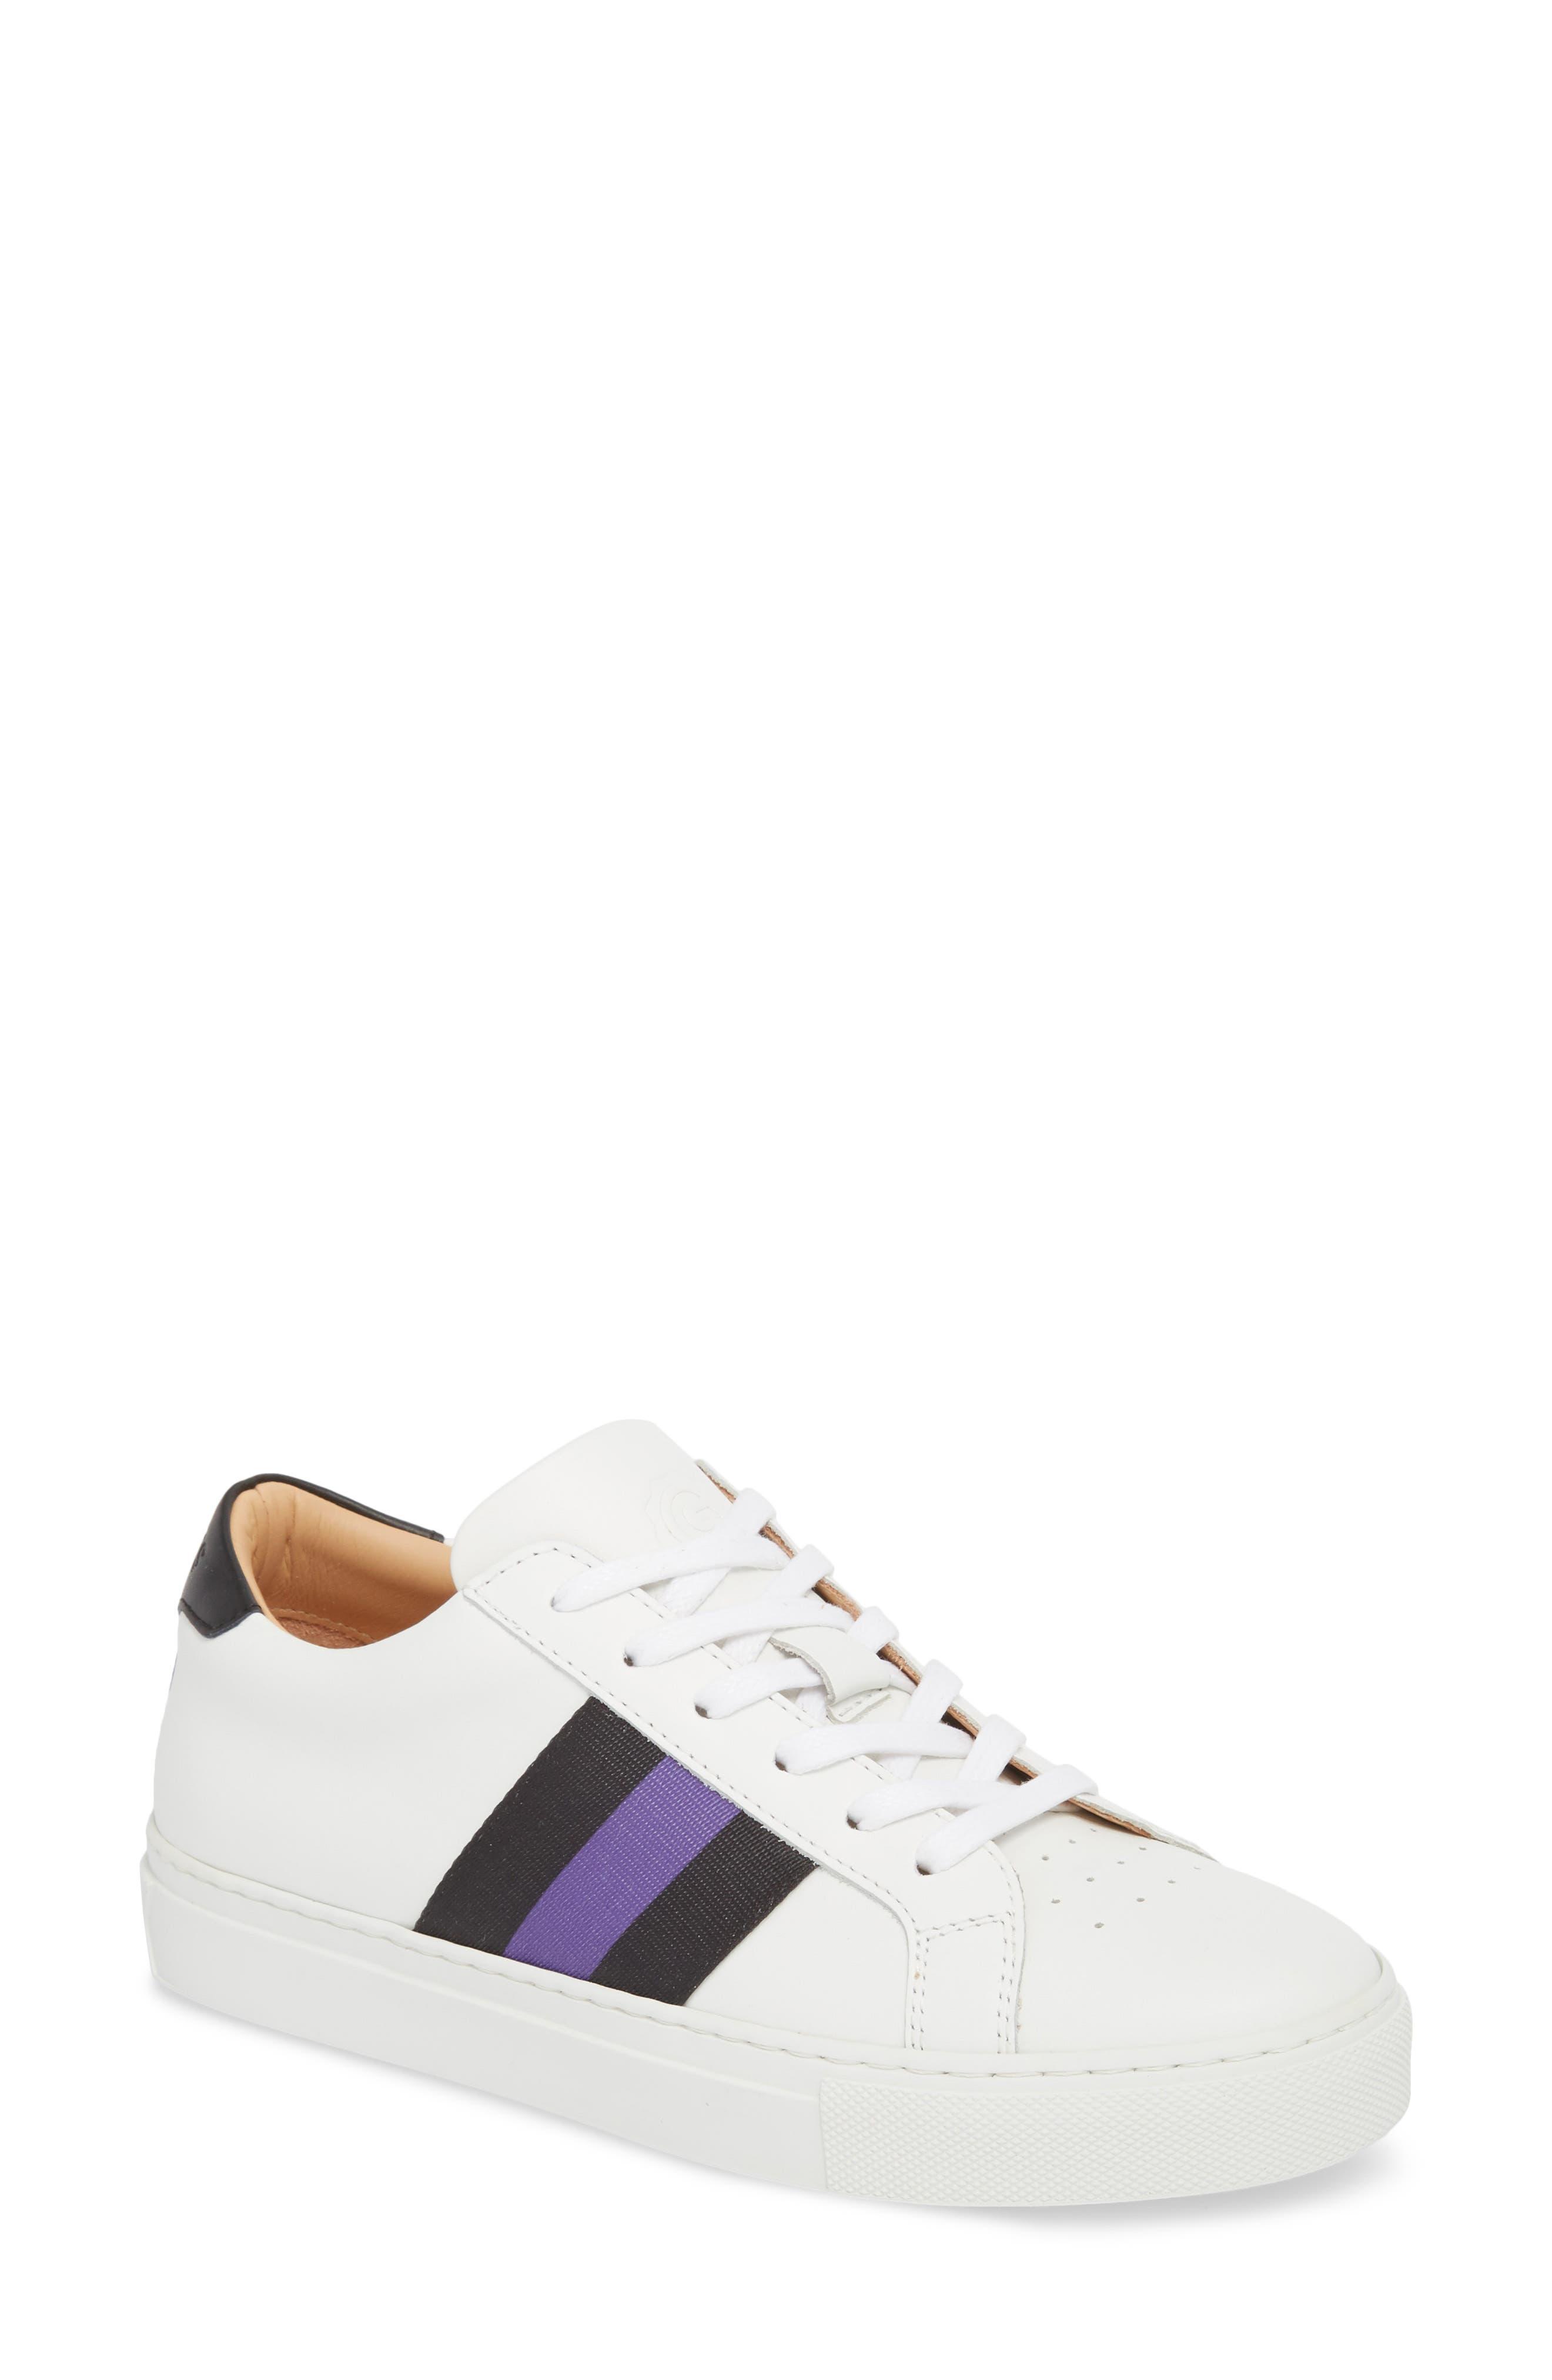 Royale Stripe Sneaker,                             Main thumbnail 1, color,                             WHITE/ BLACK/ VIOLET